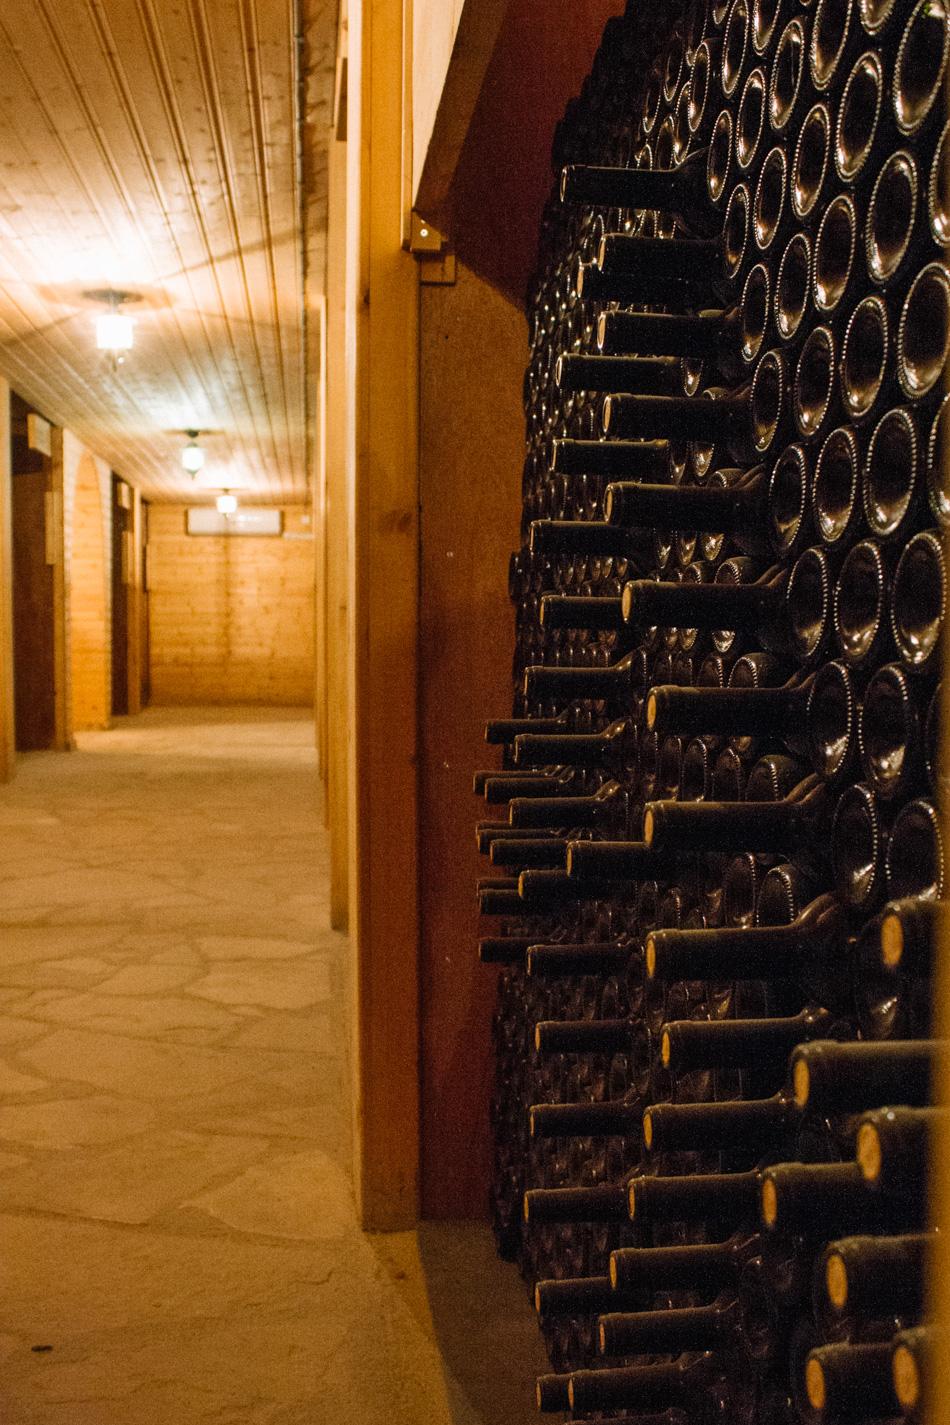 kolios winery, cyprus